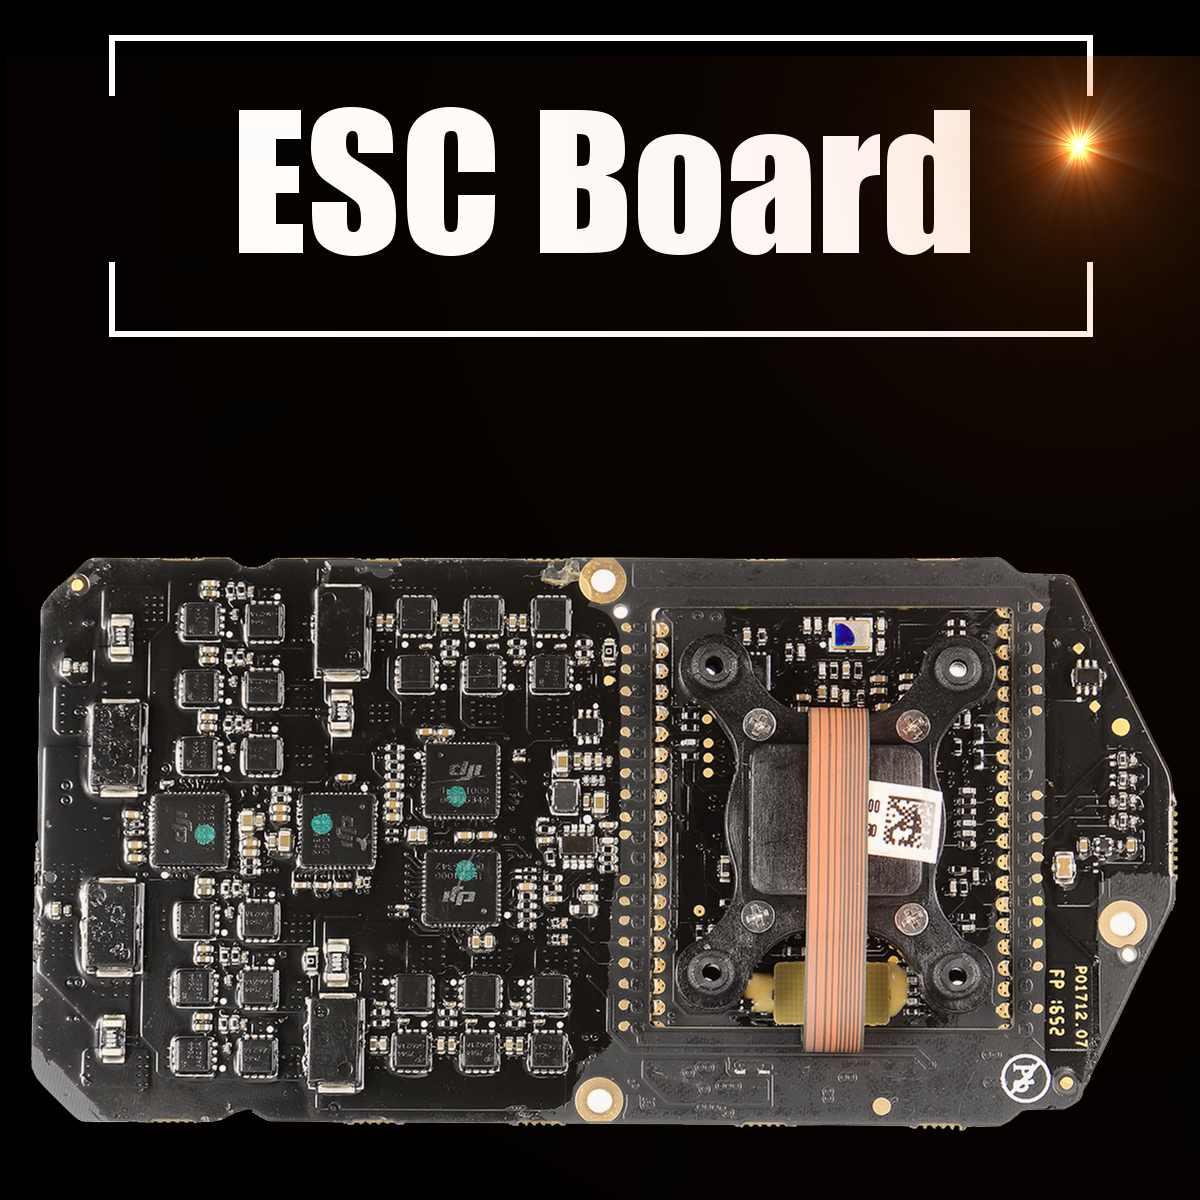 Genuine DJI Mavic Pro Flight Controller ESC Circuit Board Module Chip Replacement For RC Drone Repair Parts